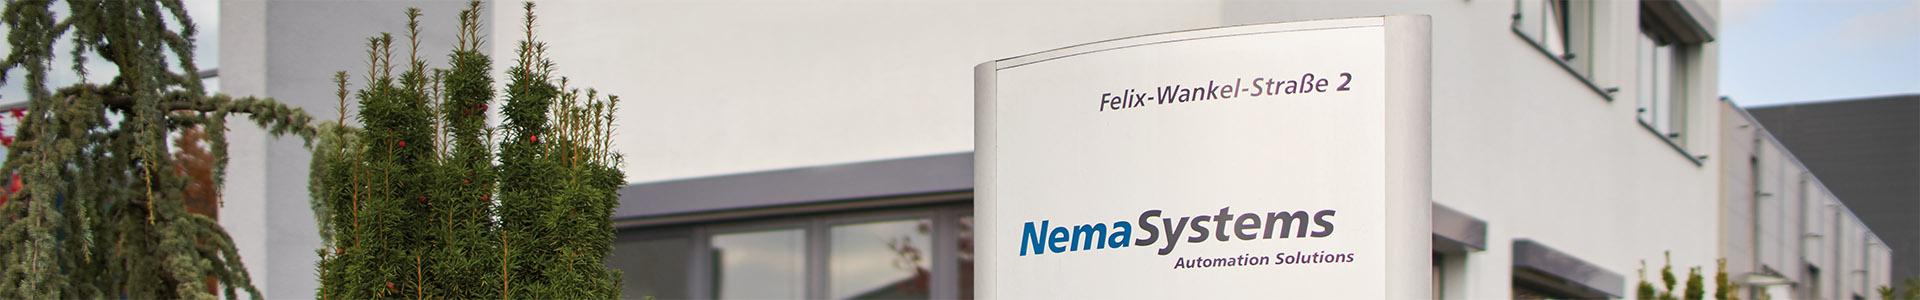 NemaSystems Impressum